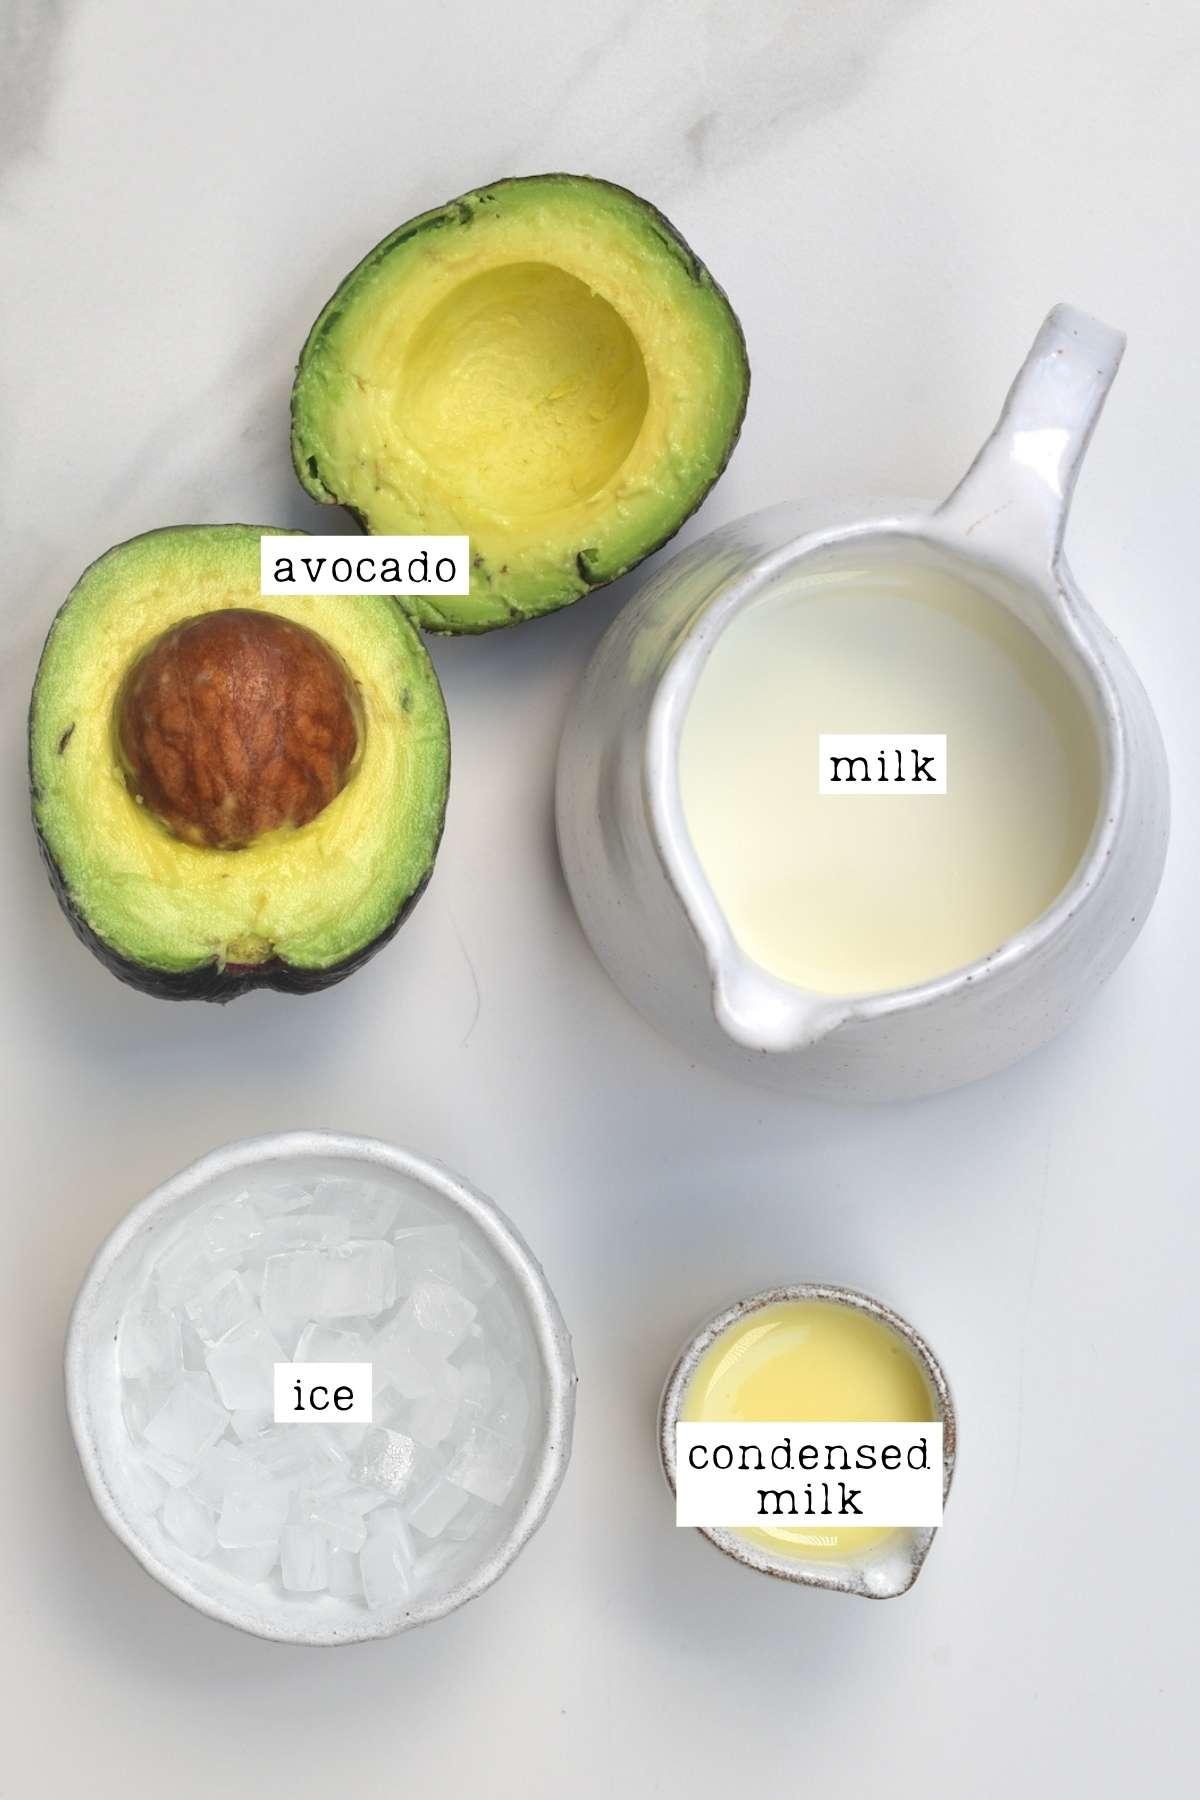 Ingredients for sweet avocado drink